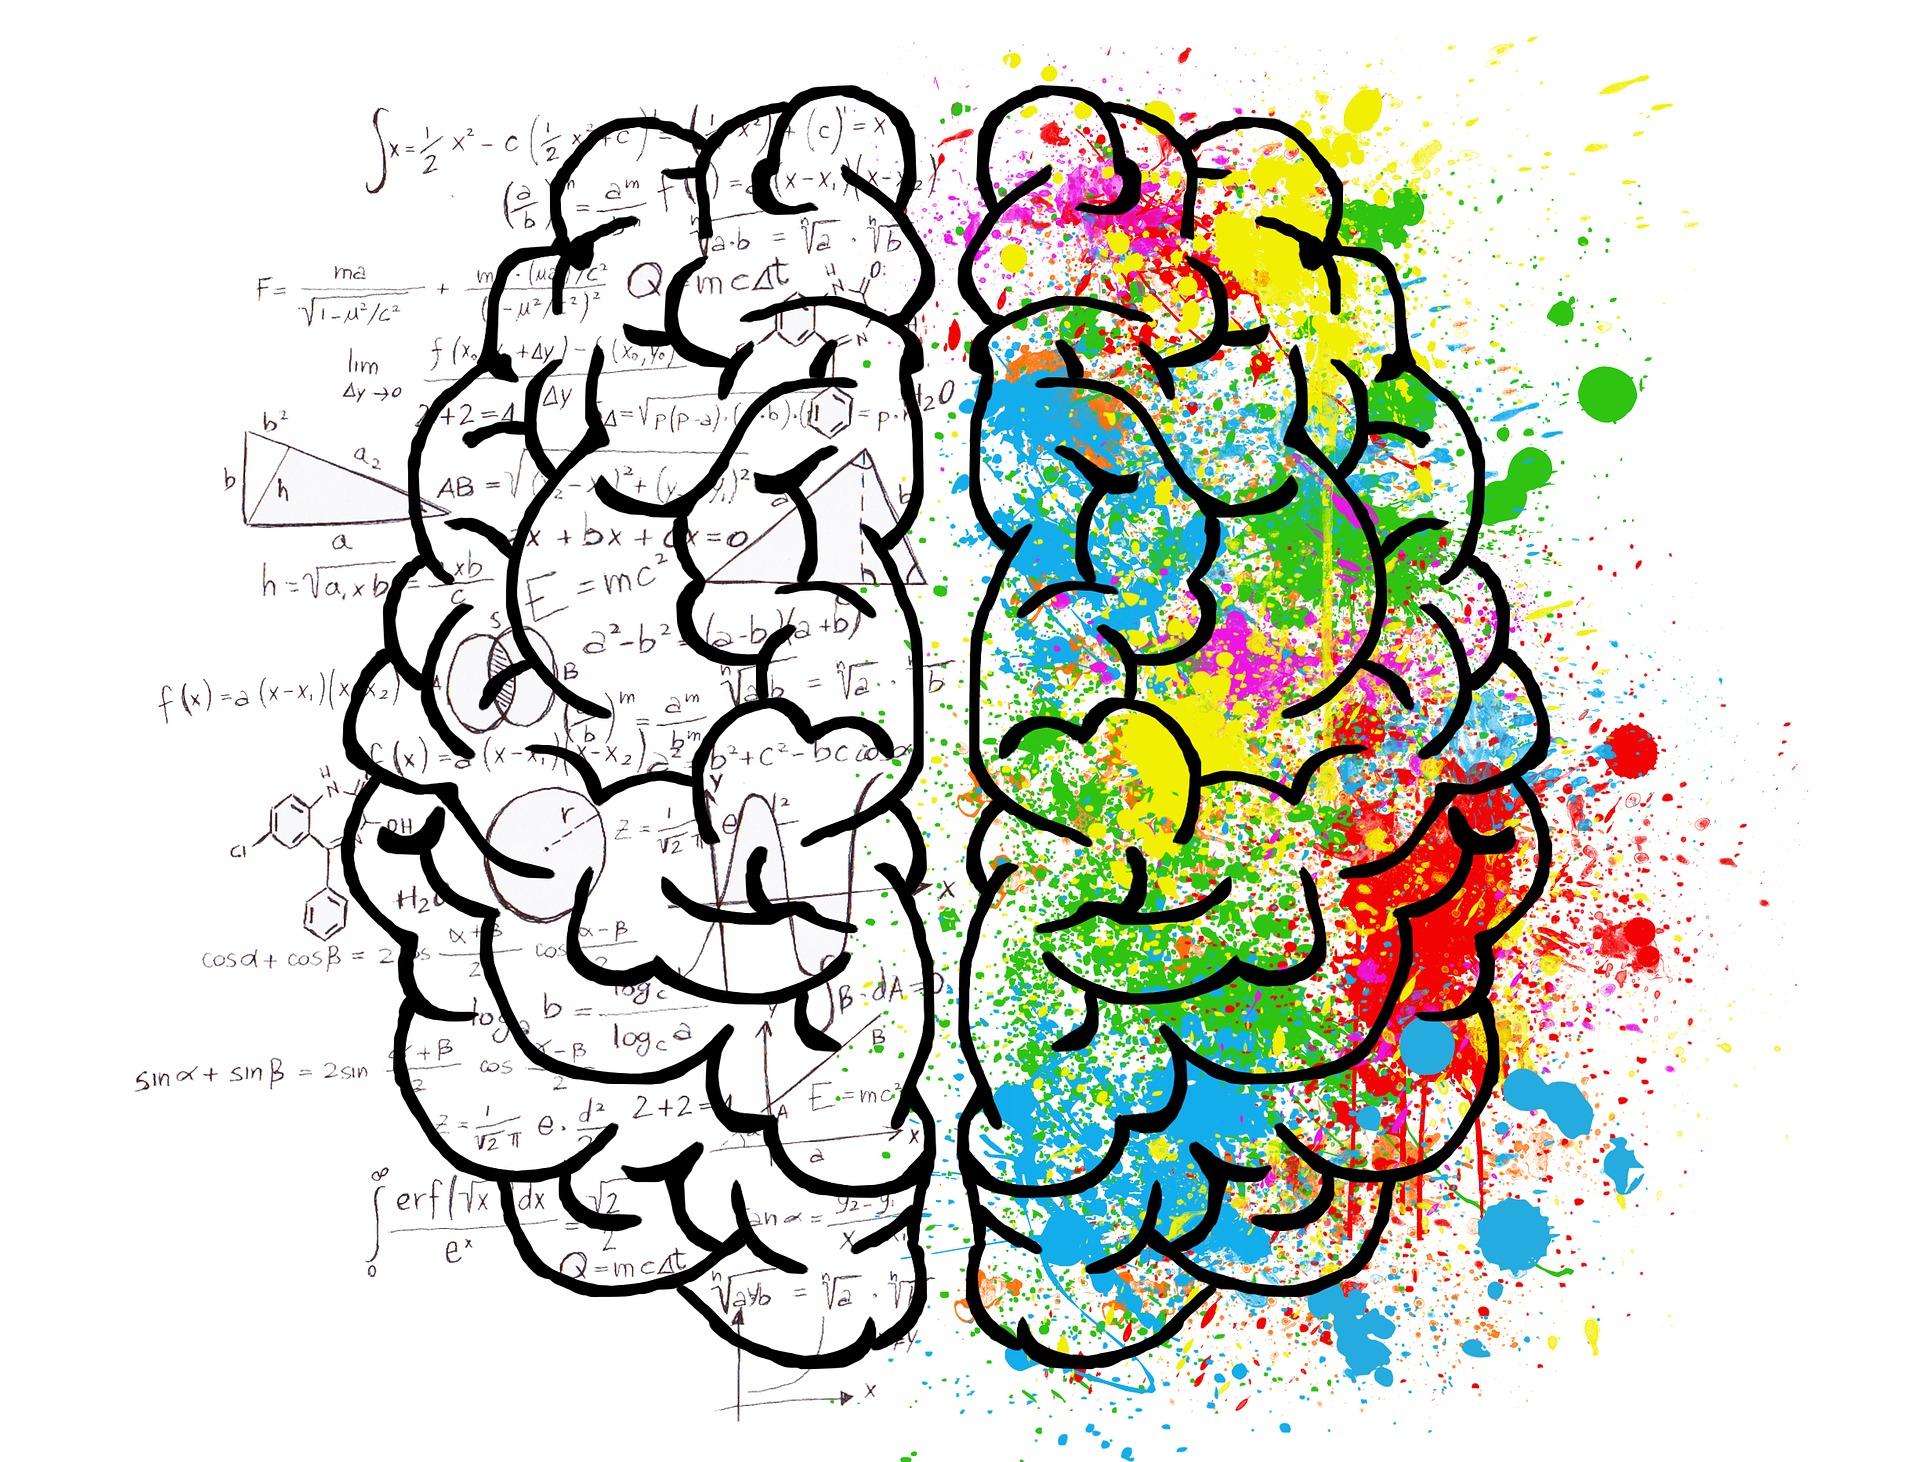 hersenen, reflexintegratie, hersenbalk, hersensamenwerking